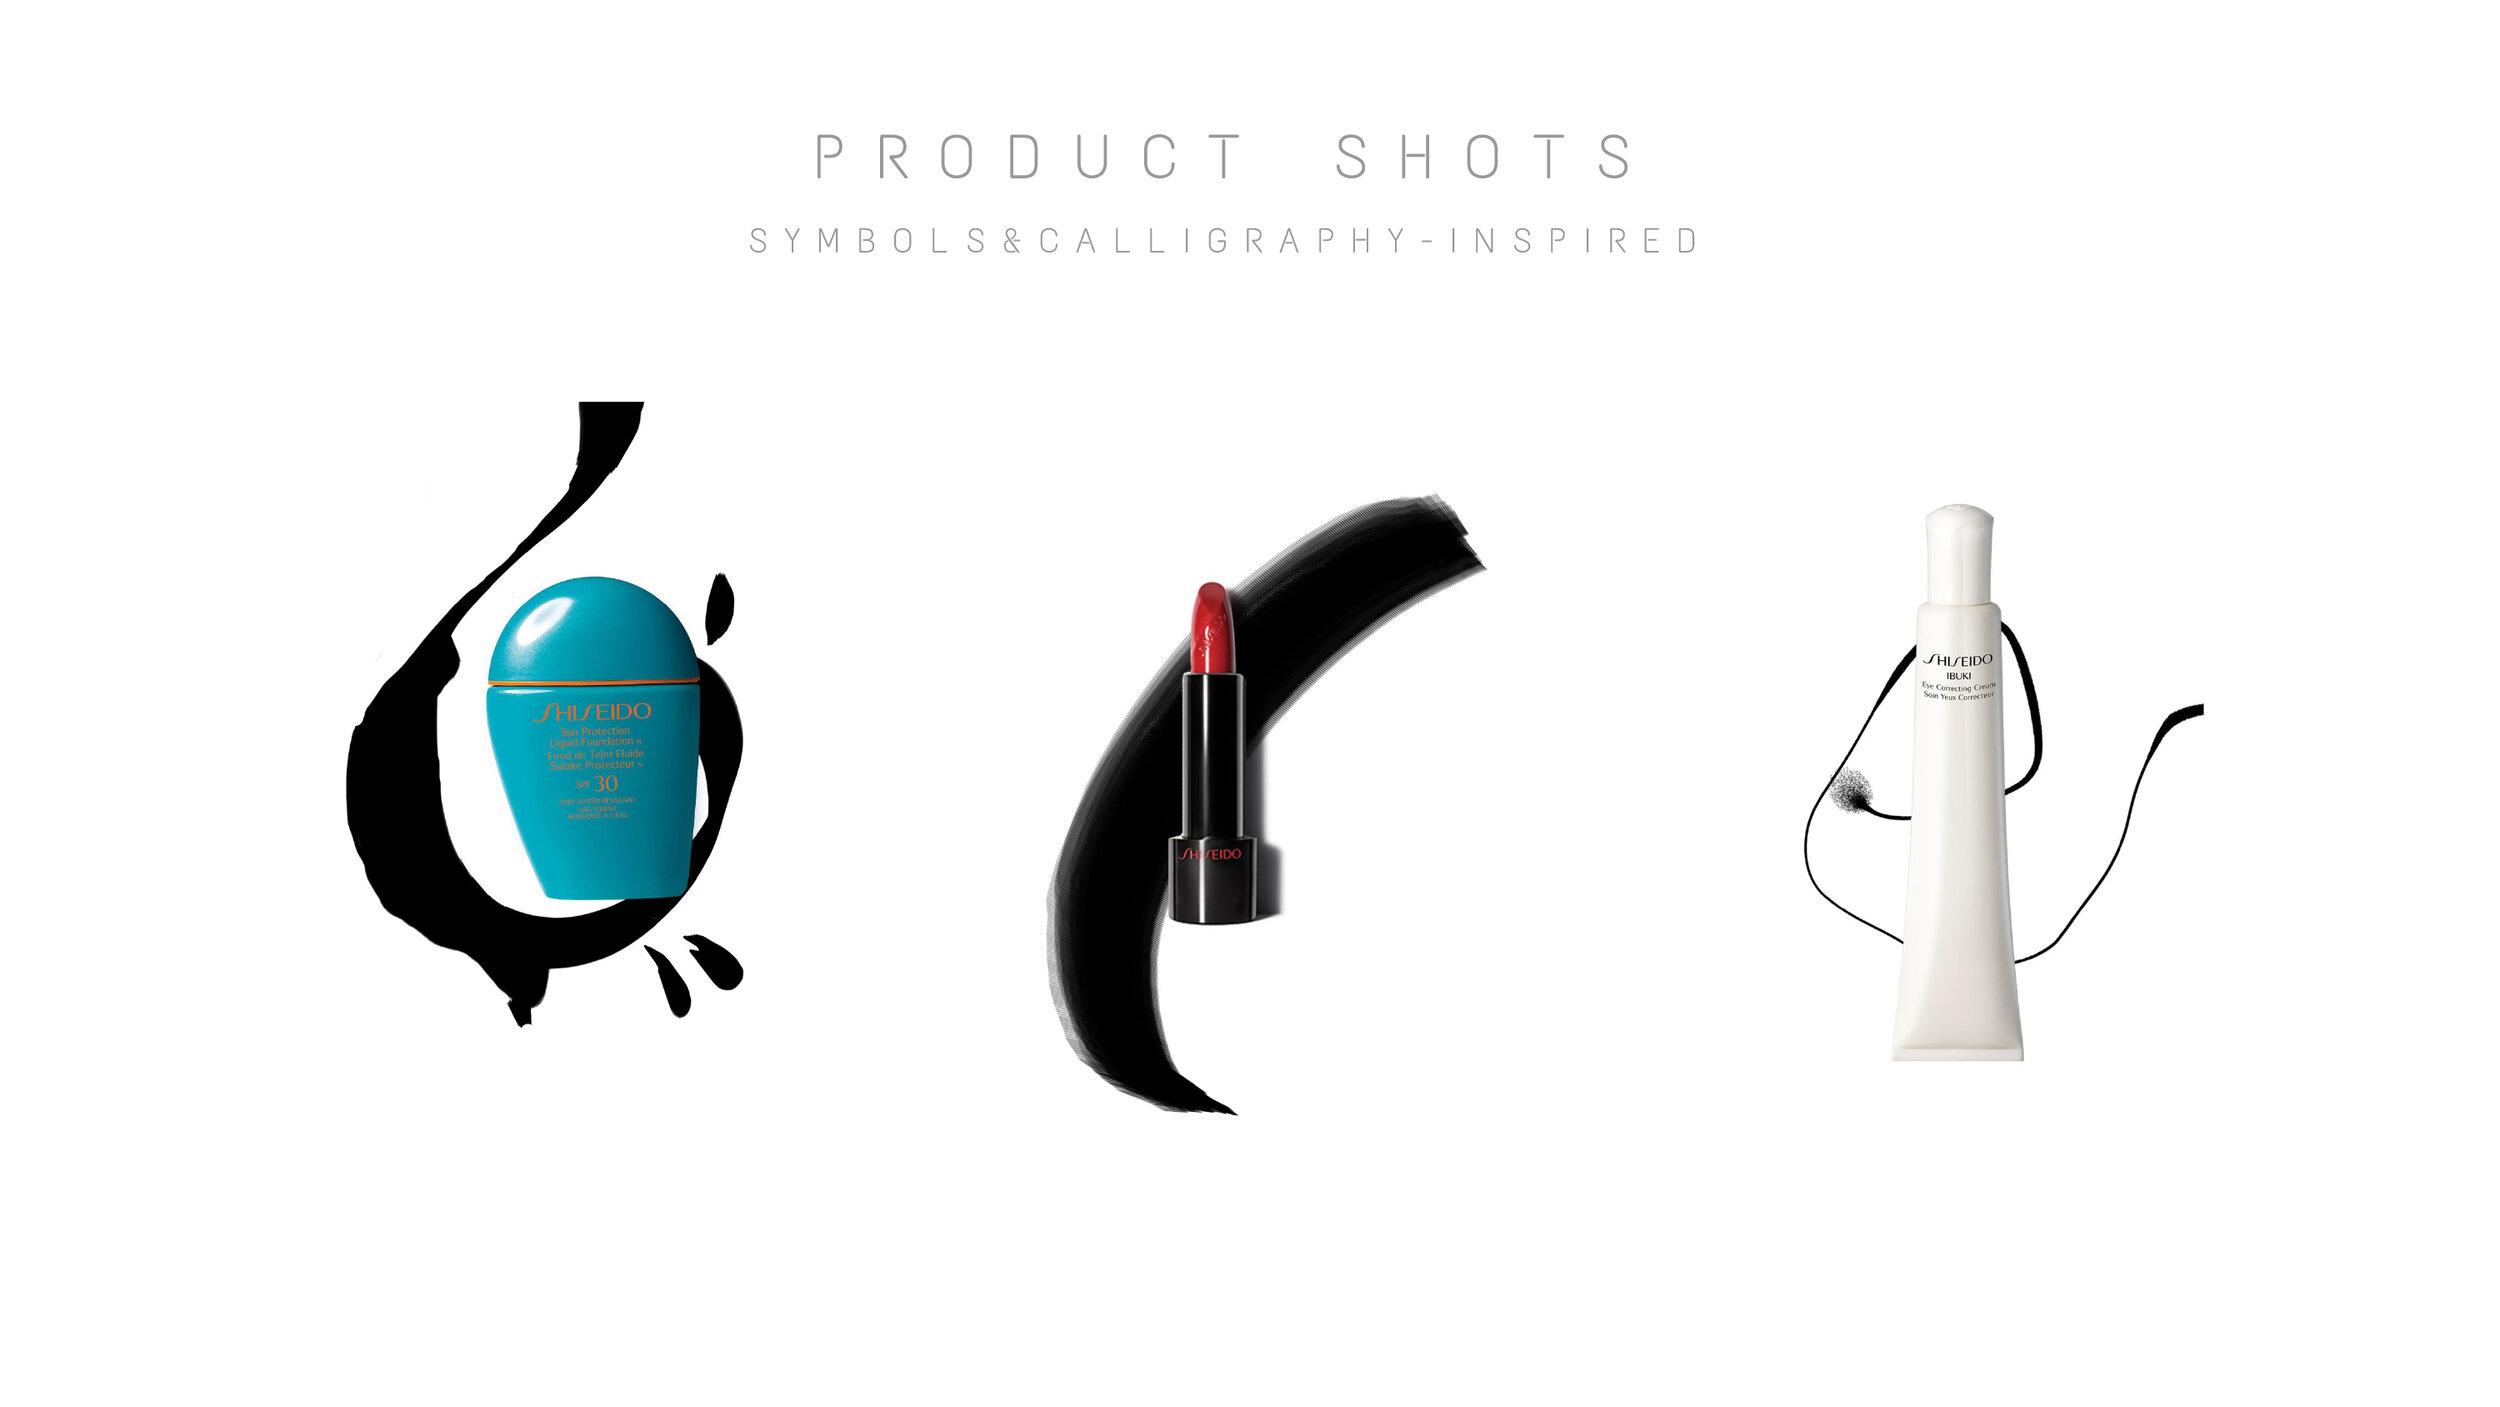 shiseido_brandbook_products1.jpg